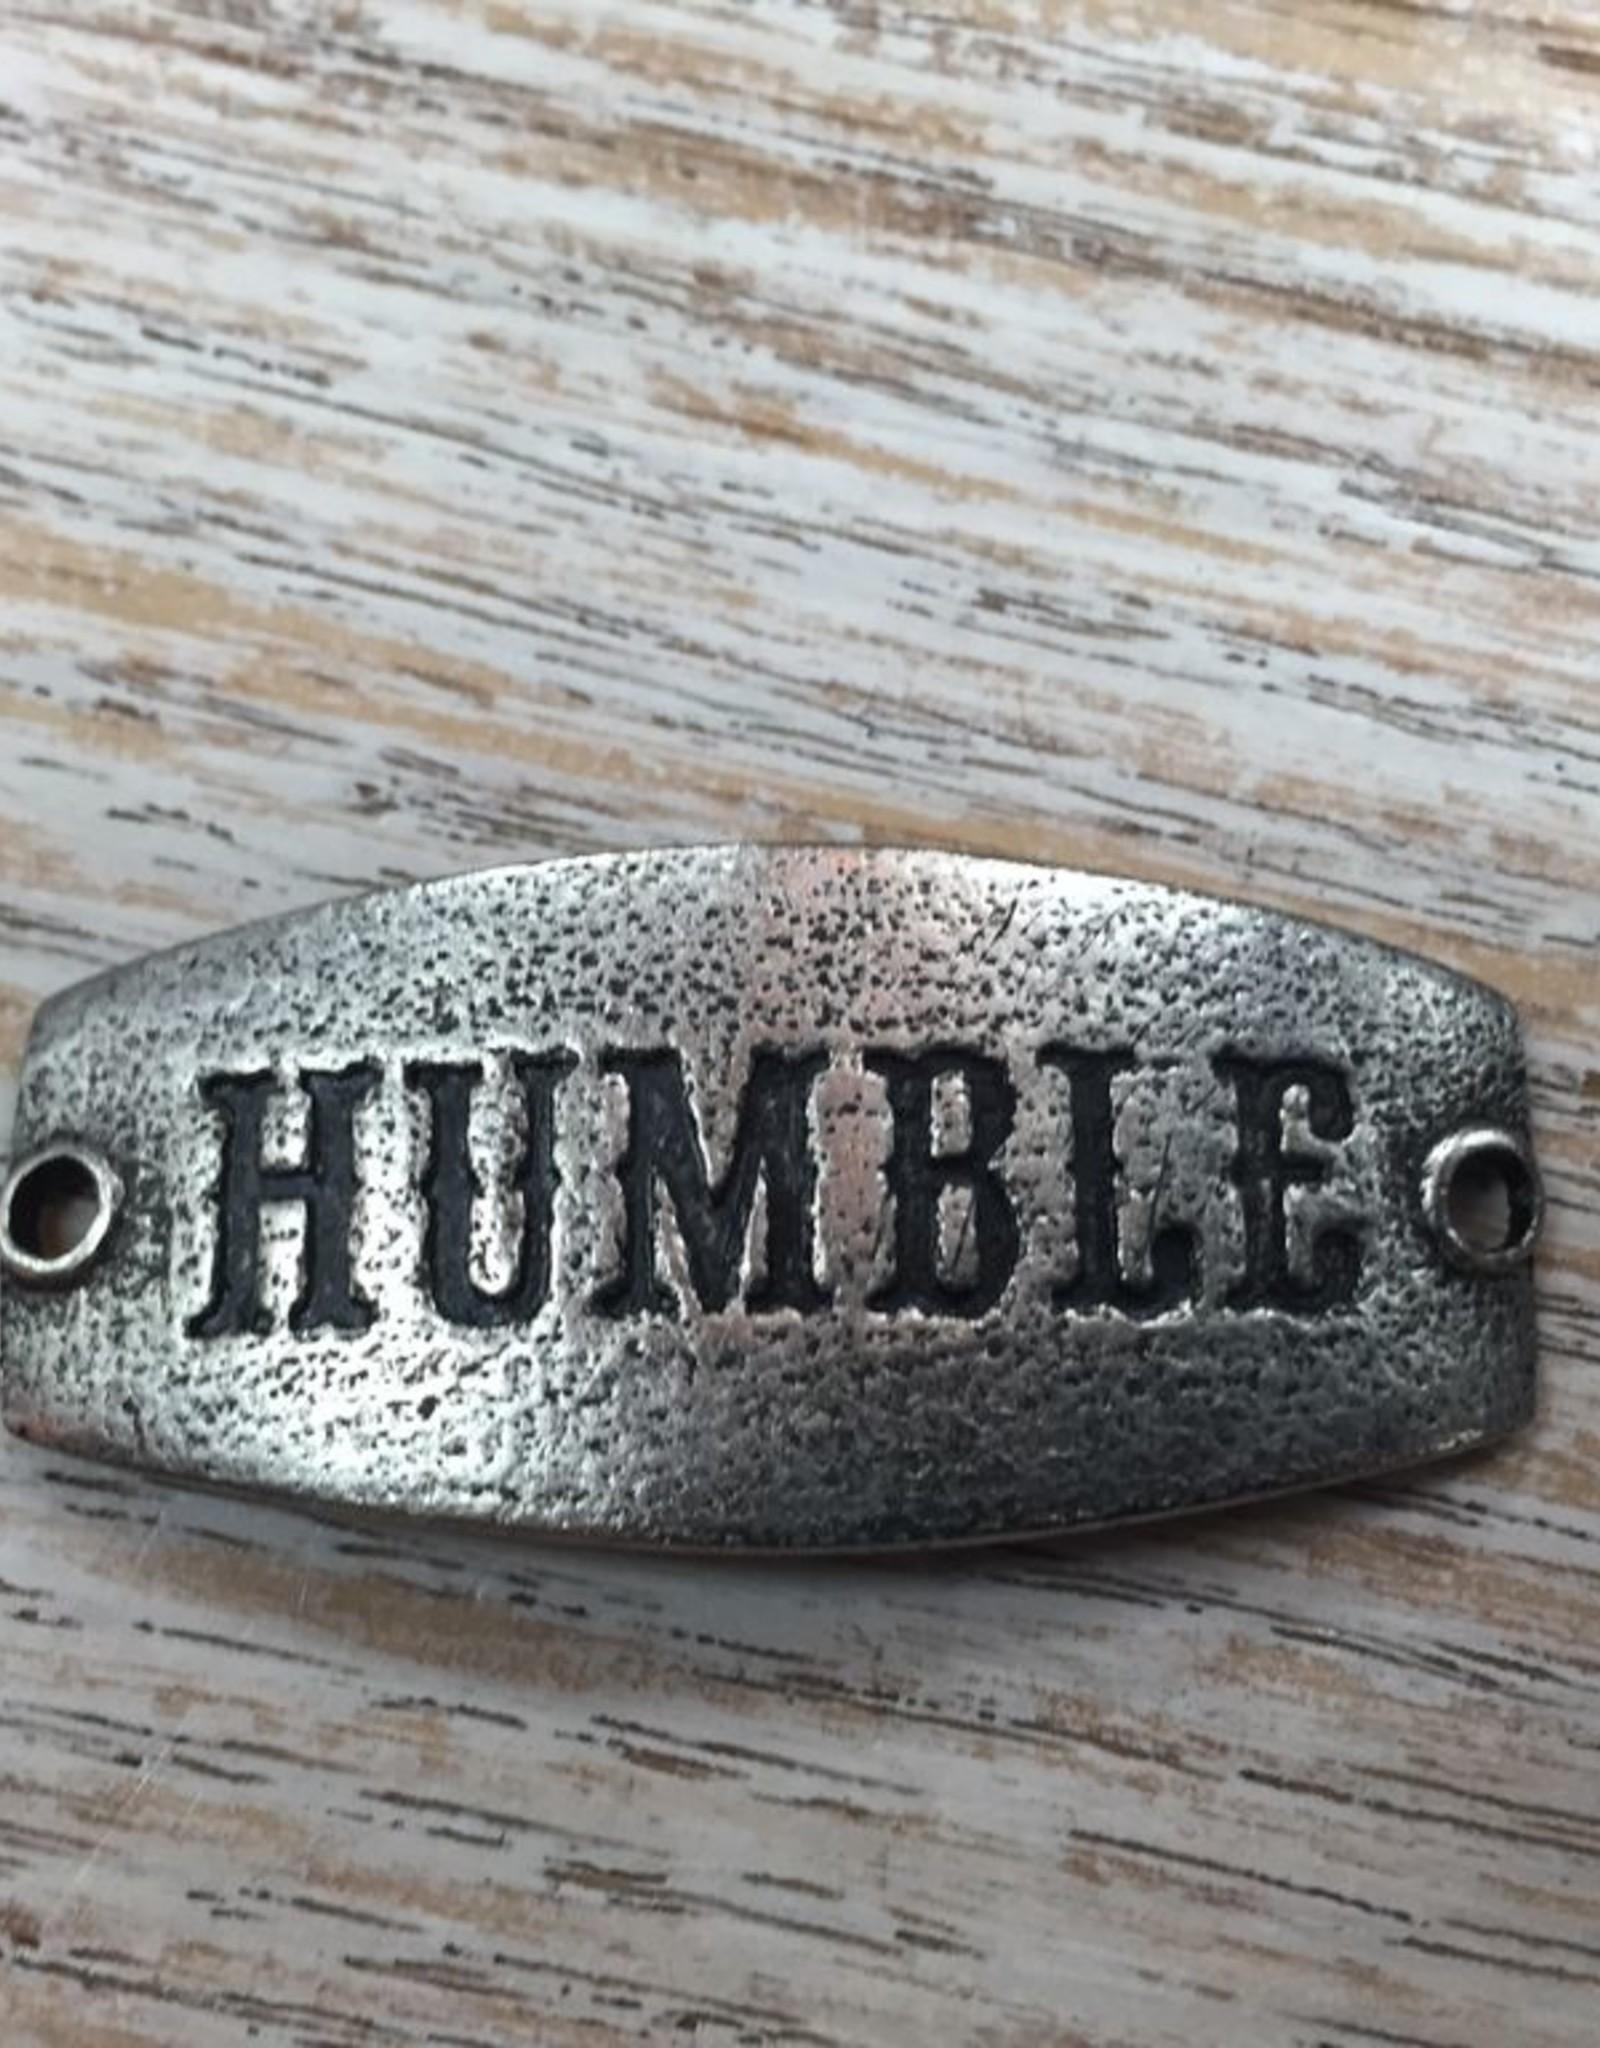 Jewelry Humble SM Sent